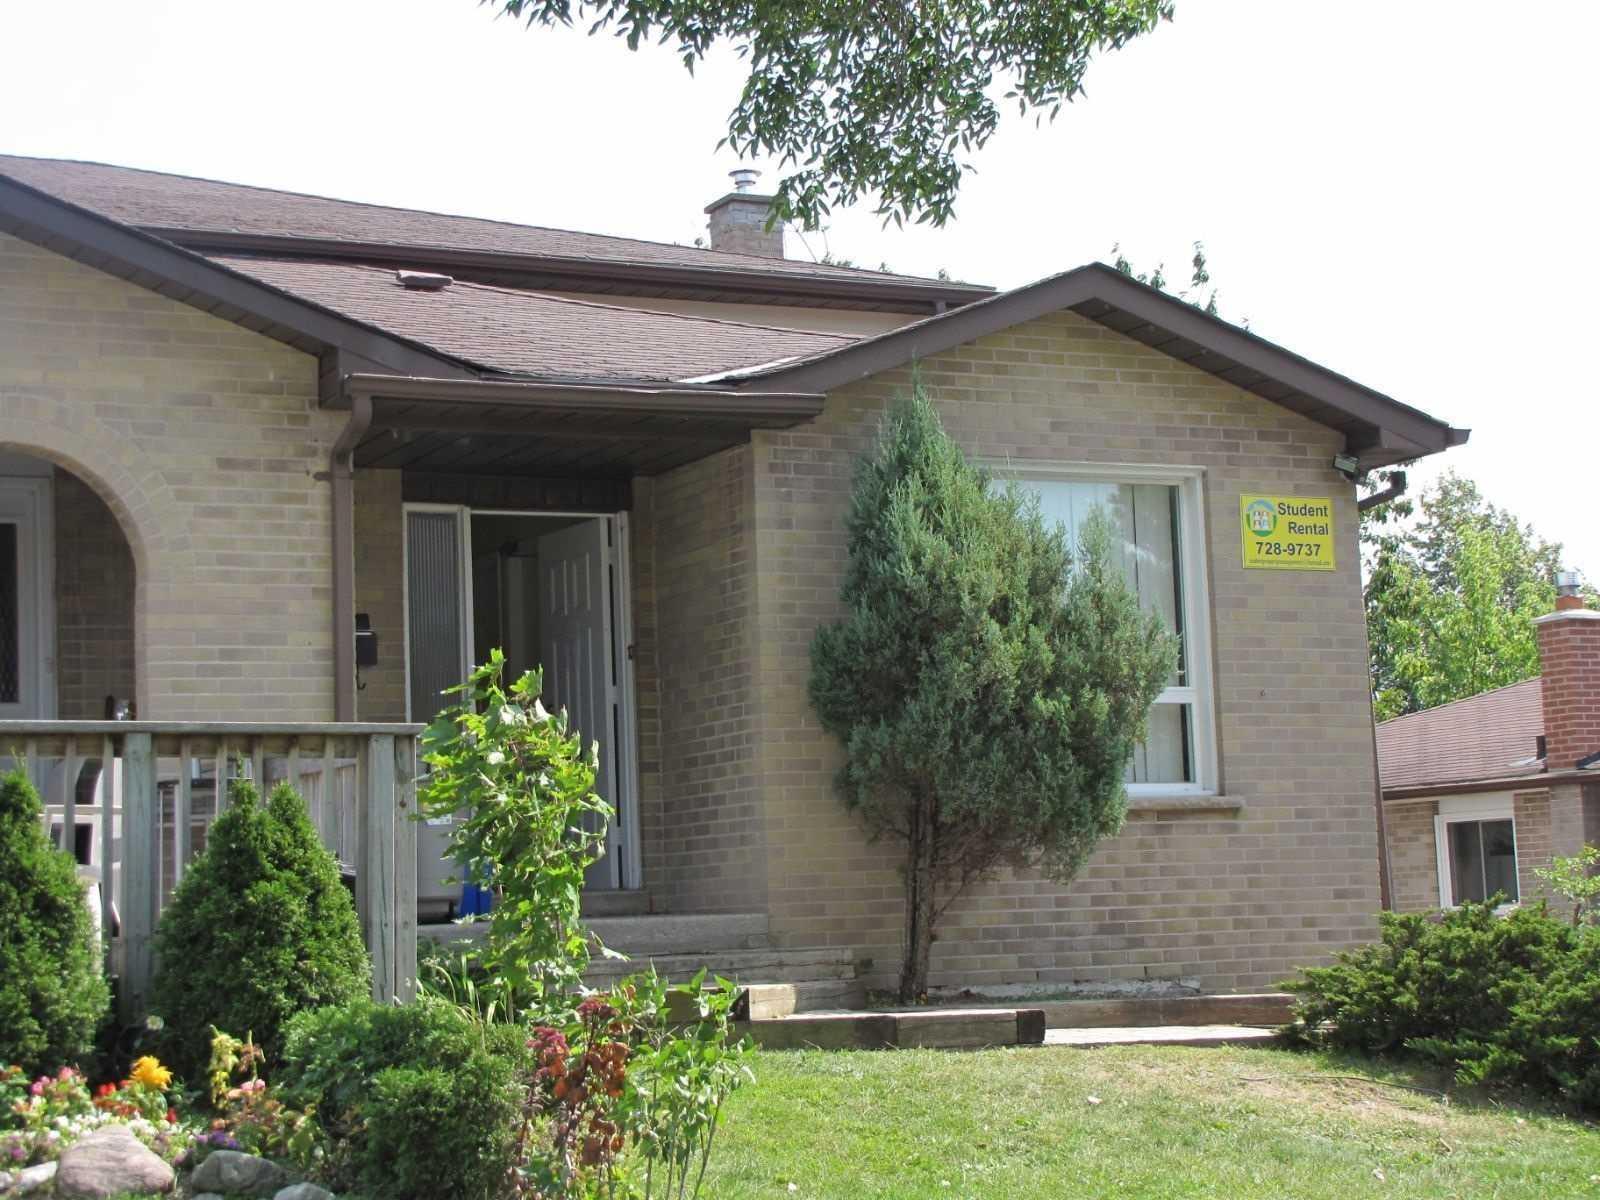 37 Sylvia St, Barrie, Ontario L4M5J2, 4 Bedrooms Bedrooms, 6 Rooms Rooms,3 BathroomsBathrooms,Semi-Detached,For Sale,Sylvia,S5352364